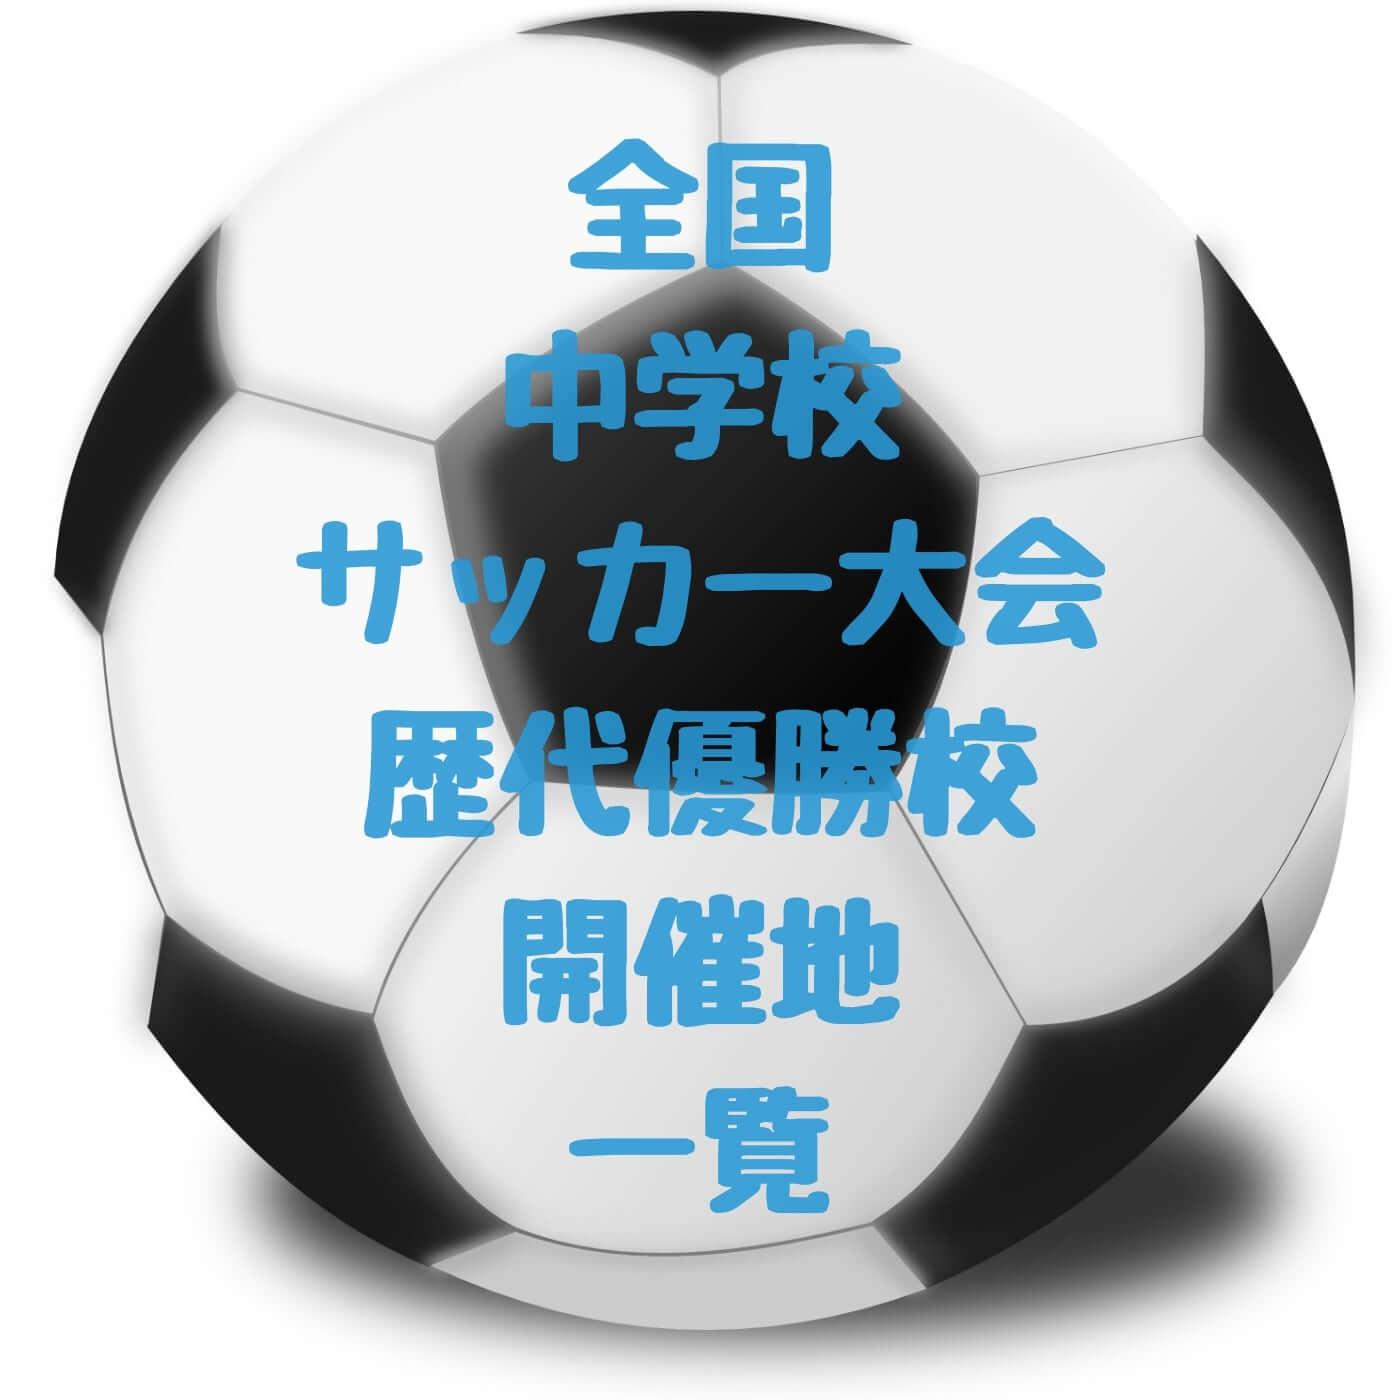 中体連サッカー全国大会歴代